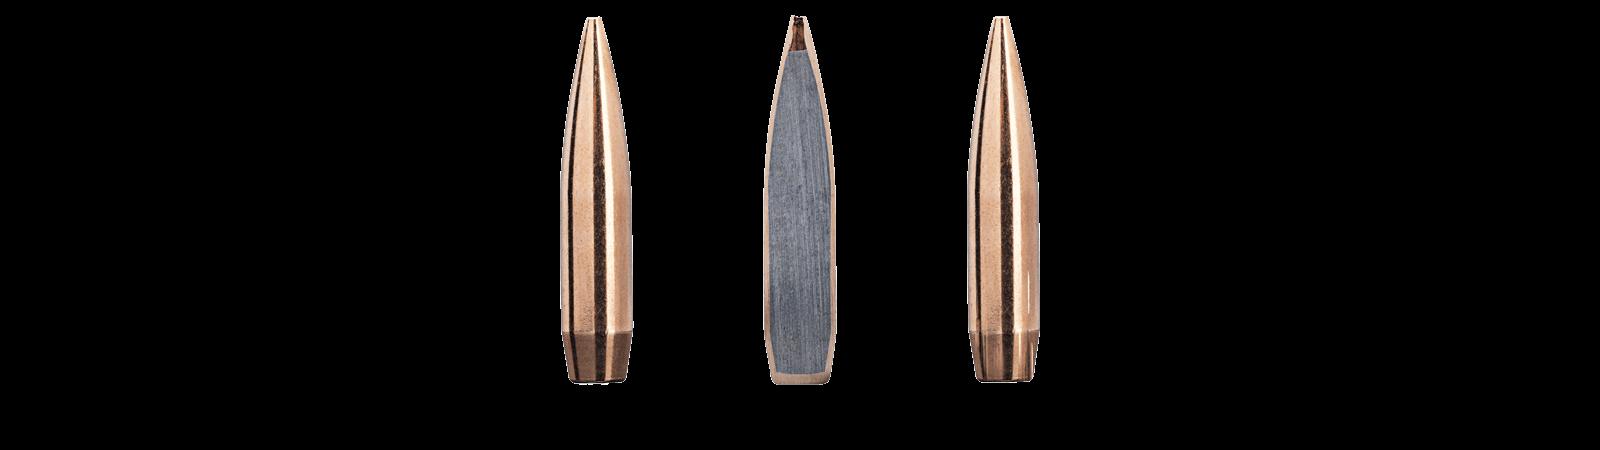 Sako 6,5x55 SE Racehead  9g (119H) 20 kpl / ras